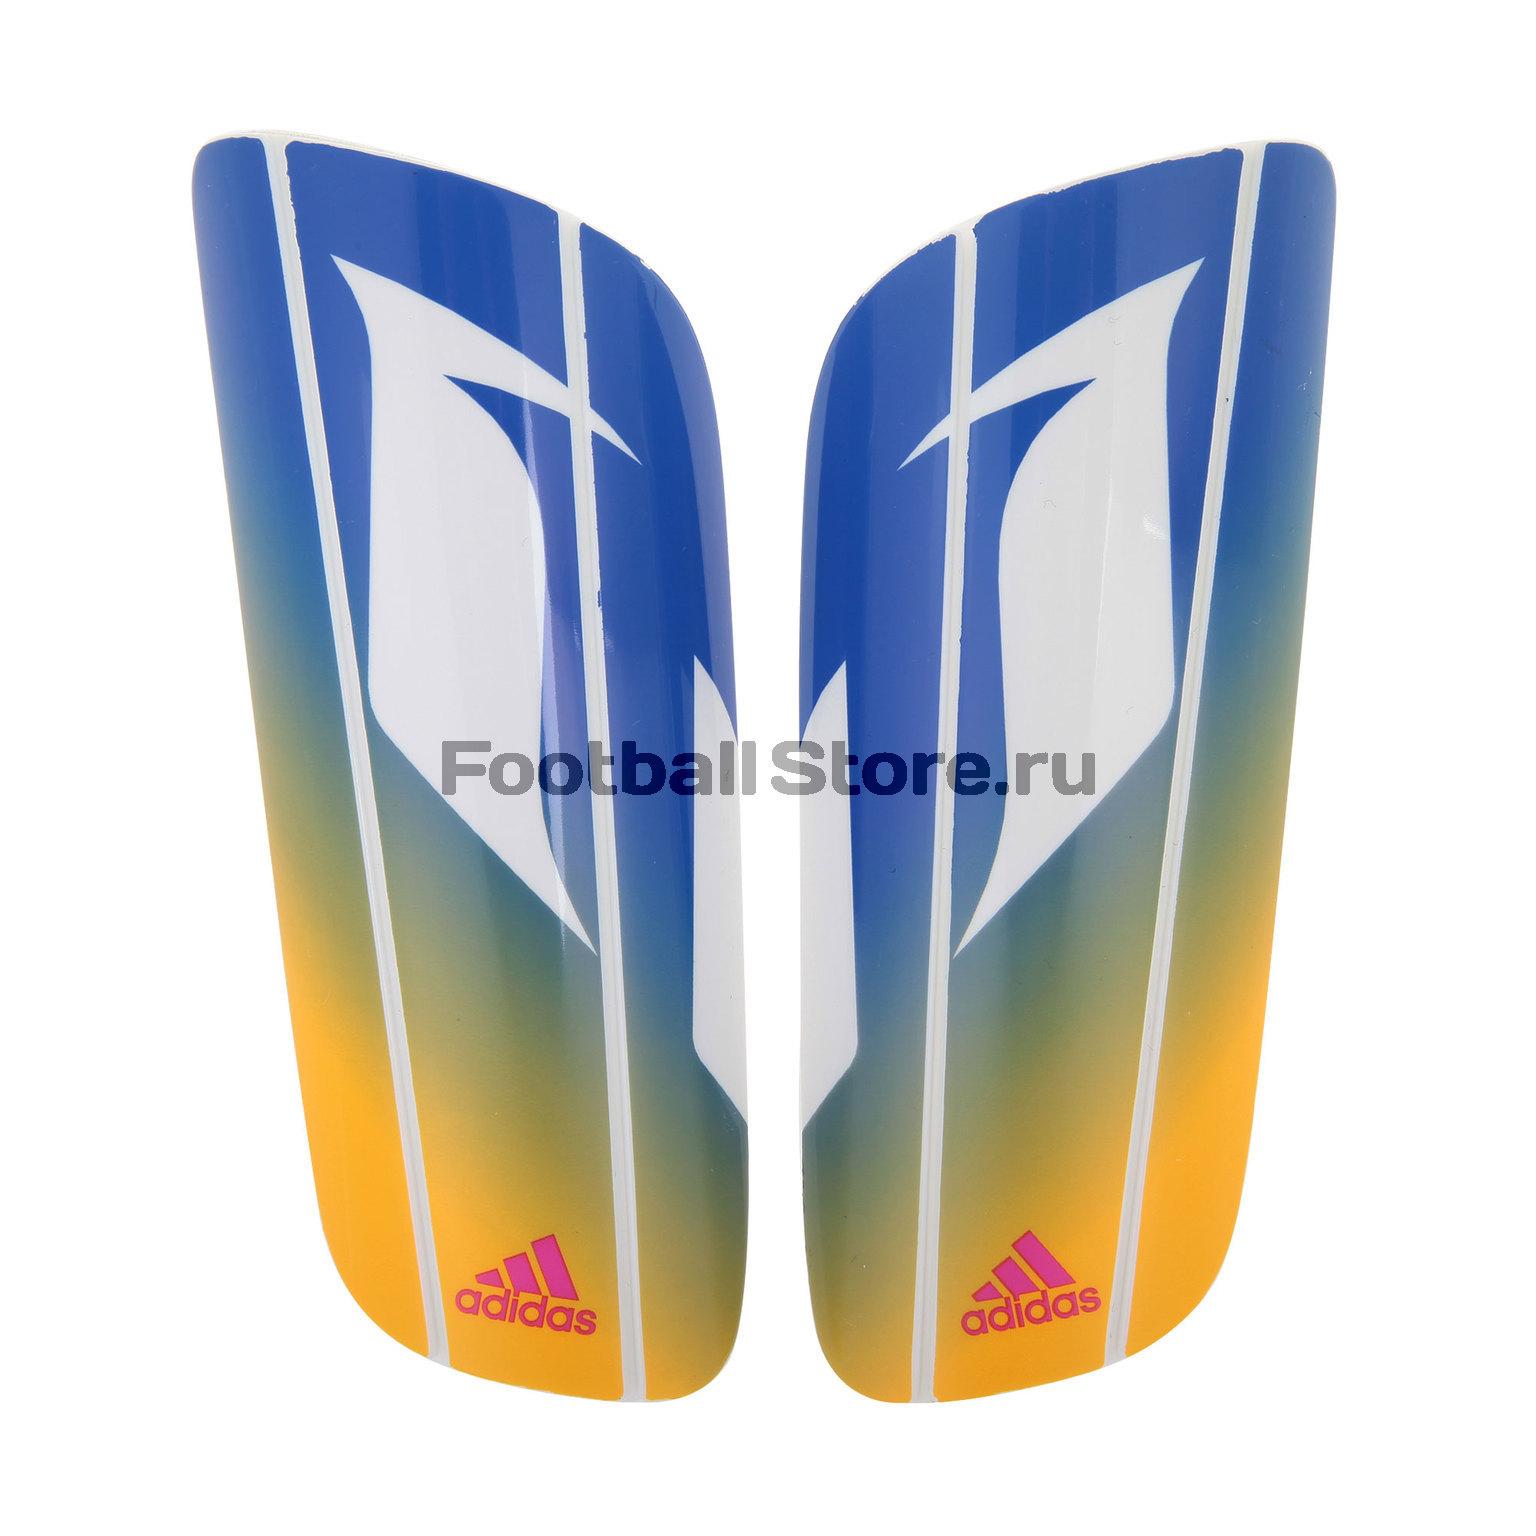 Аксессуары Adidas Щитки Adidas Messi 10 Lesto  AZ9869